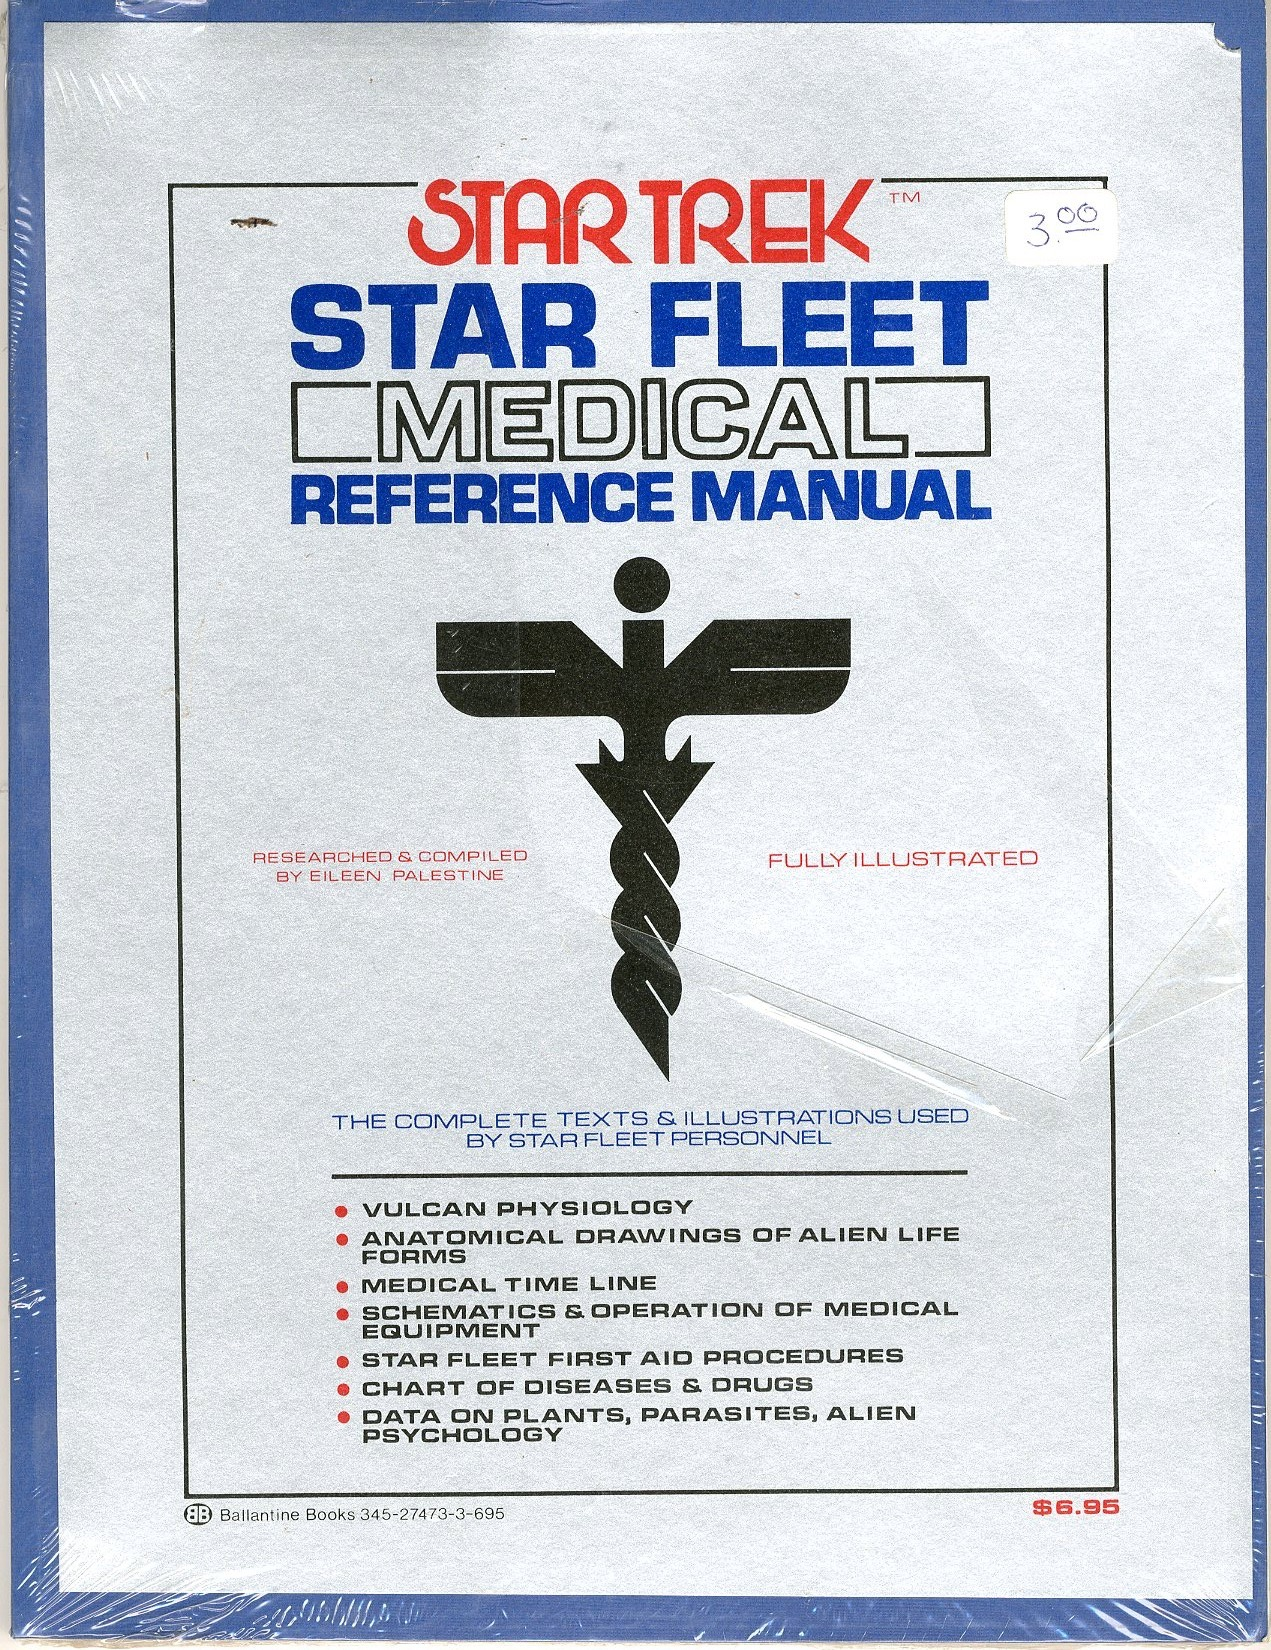 Starfleet medical reference manual